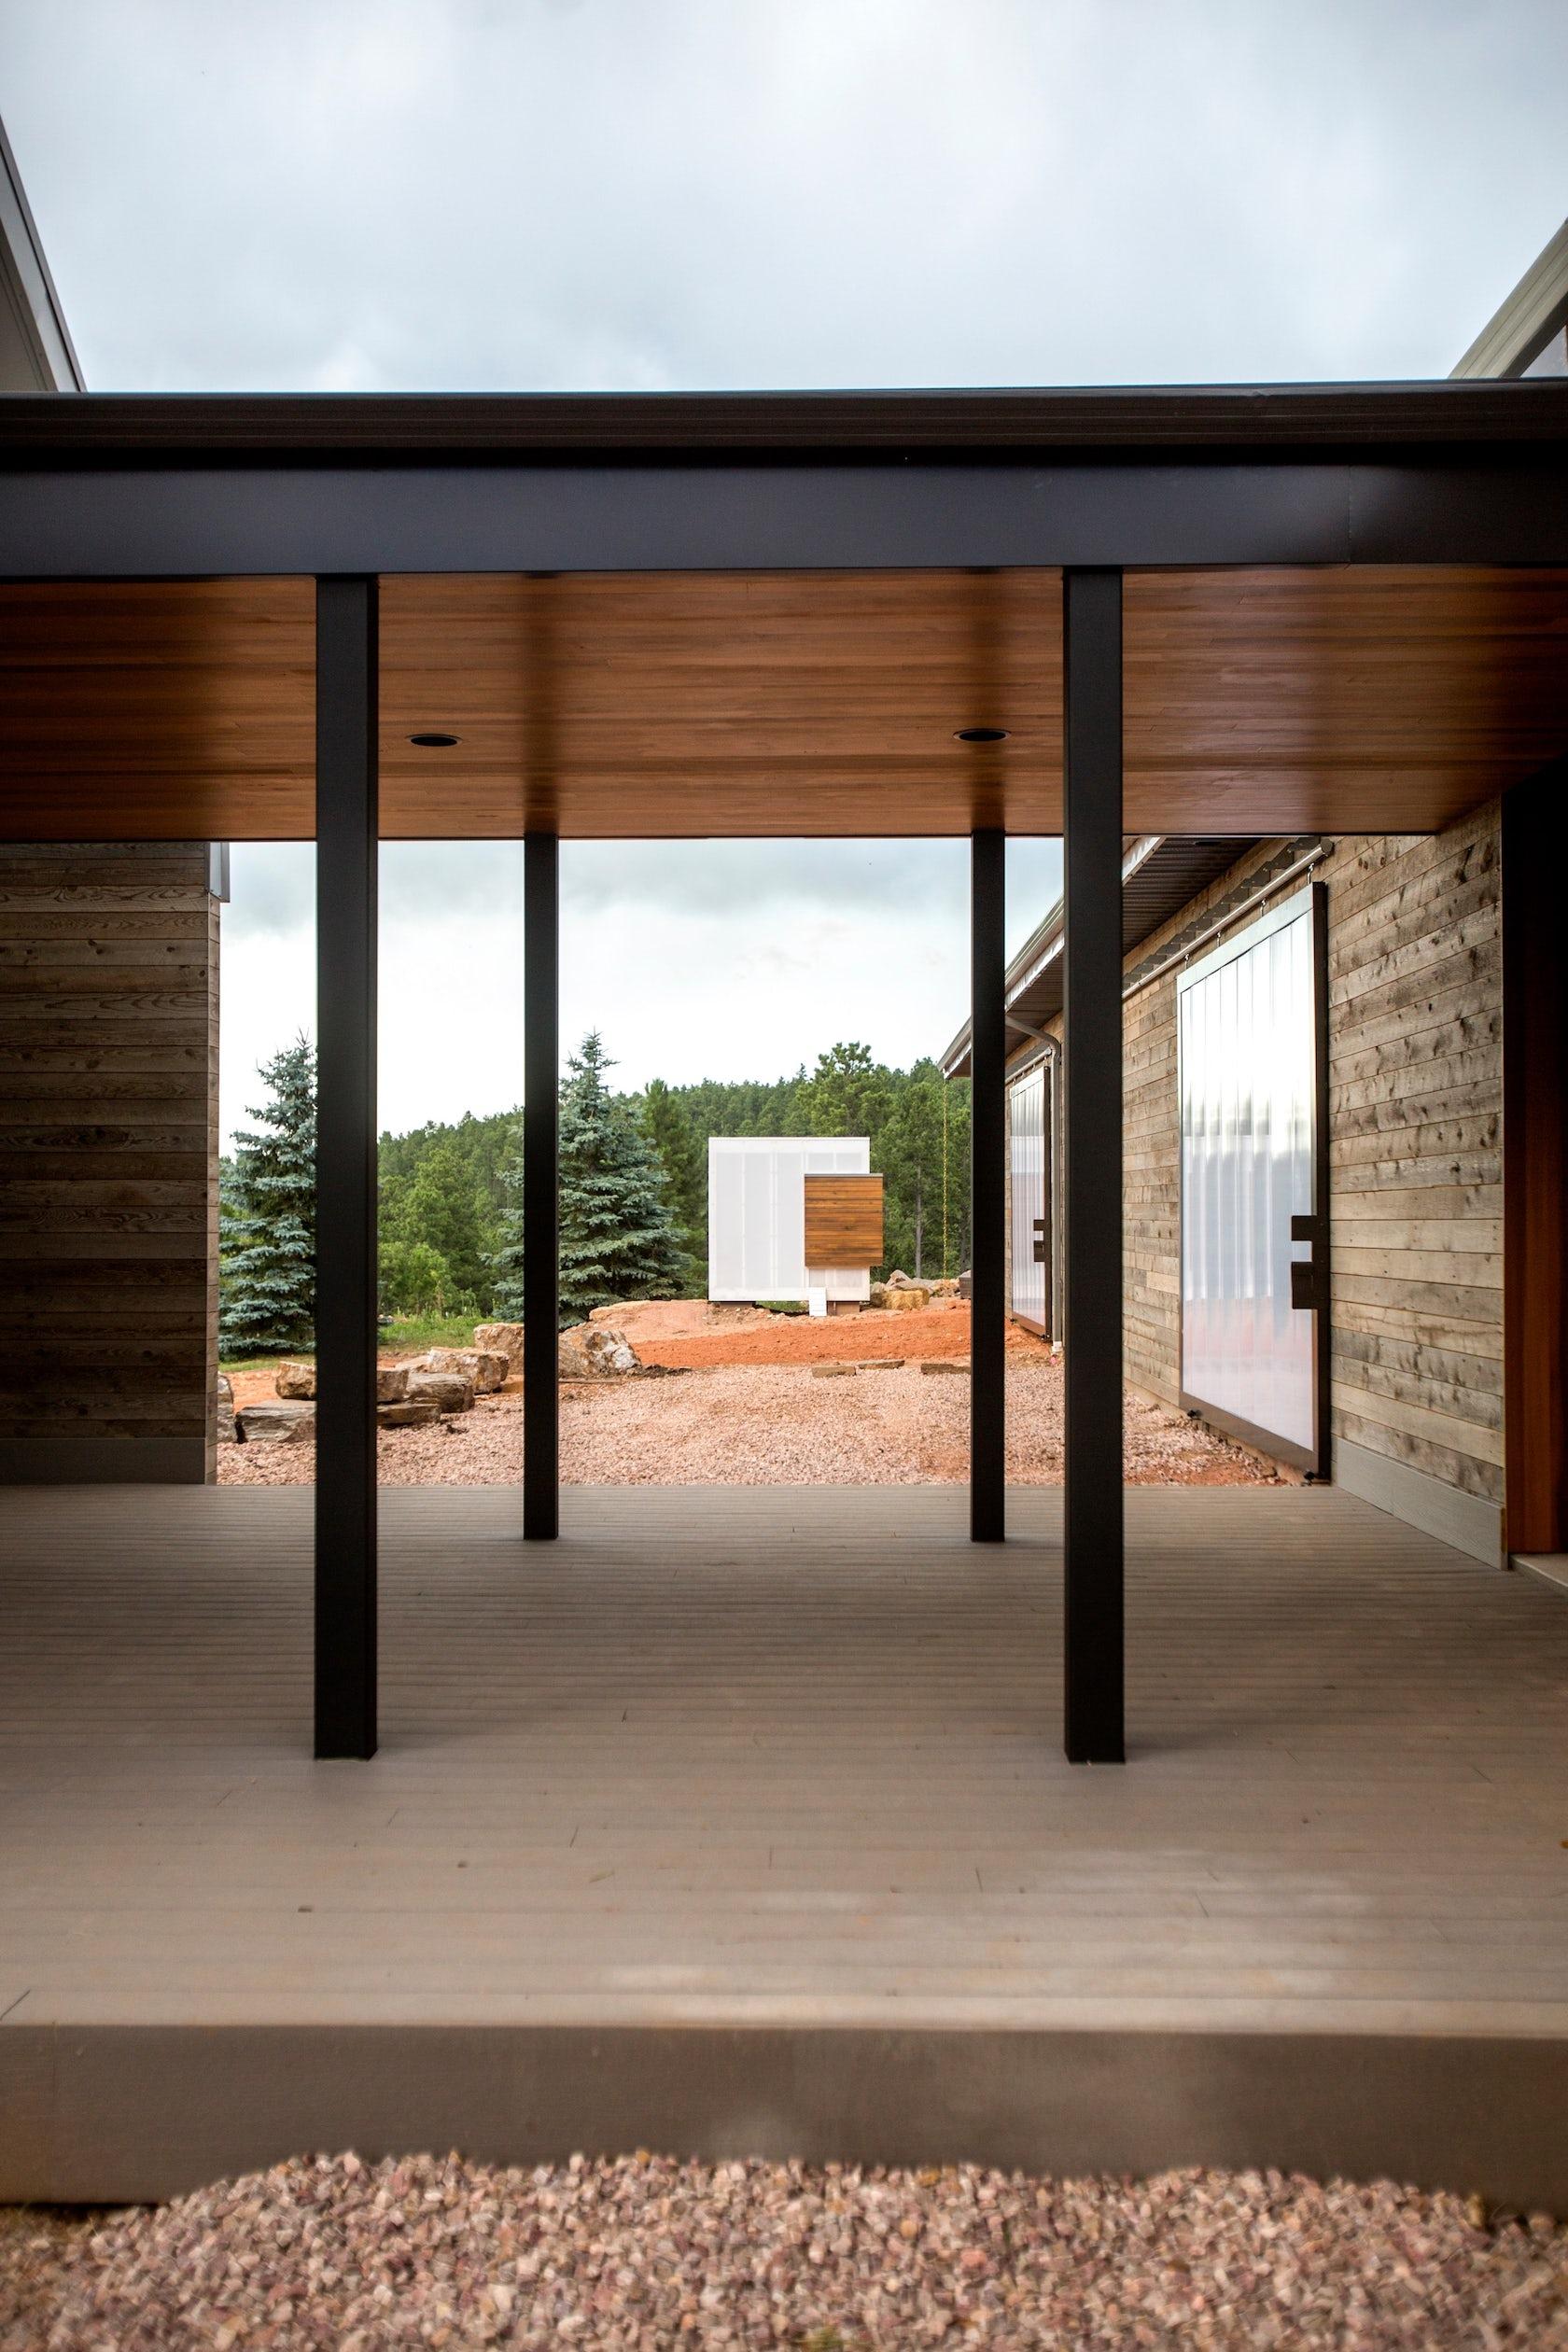 Tomecek Studio Architecture